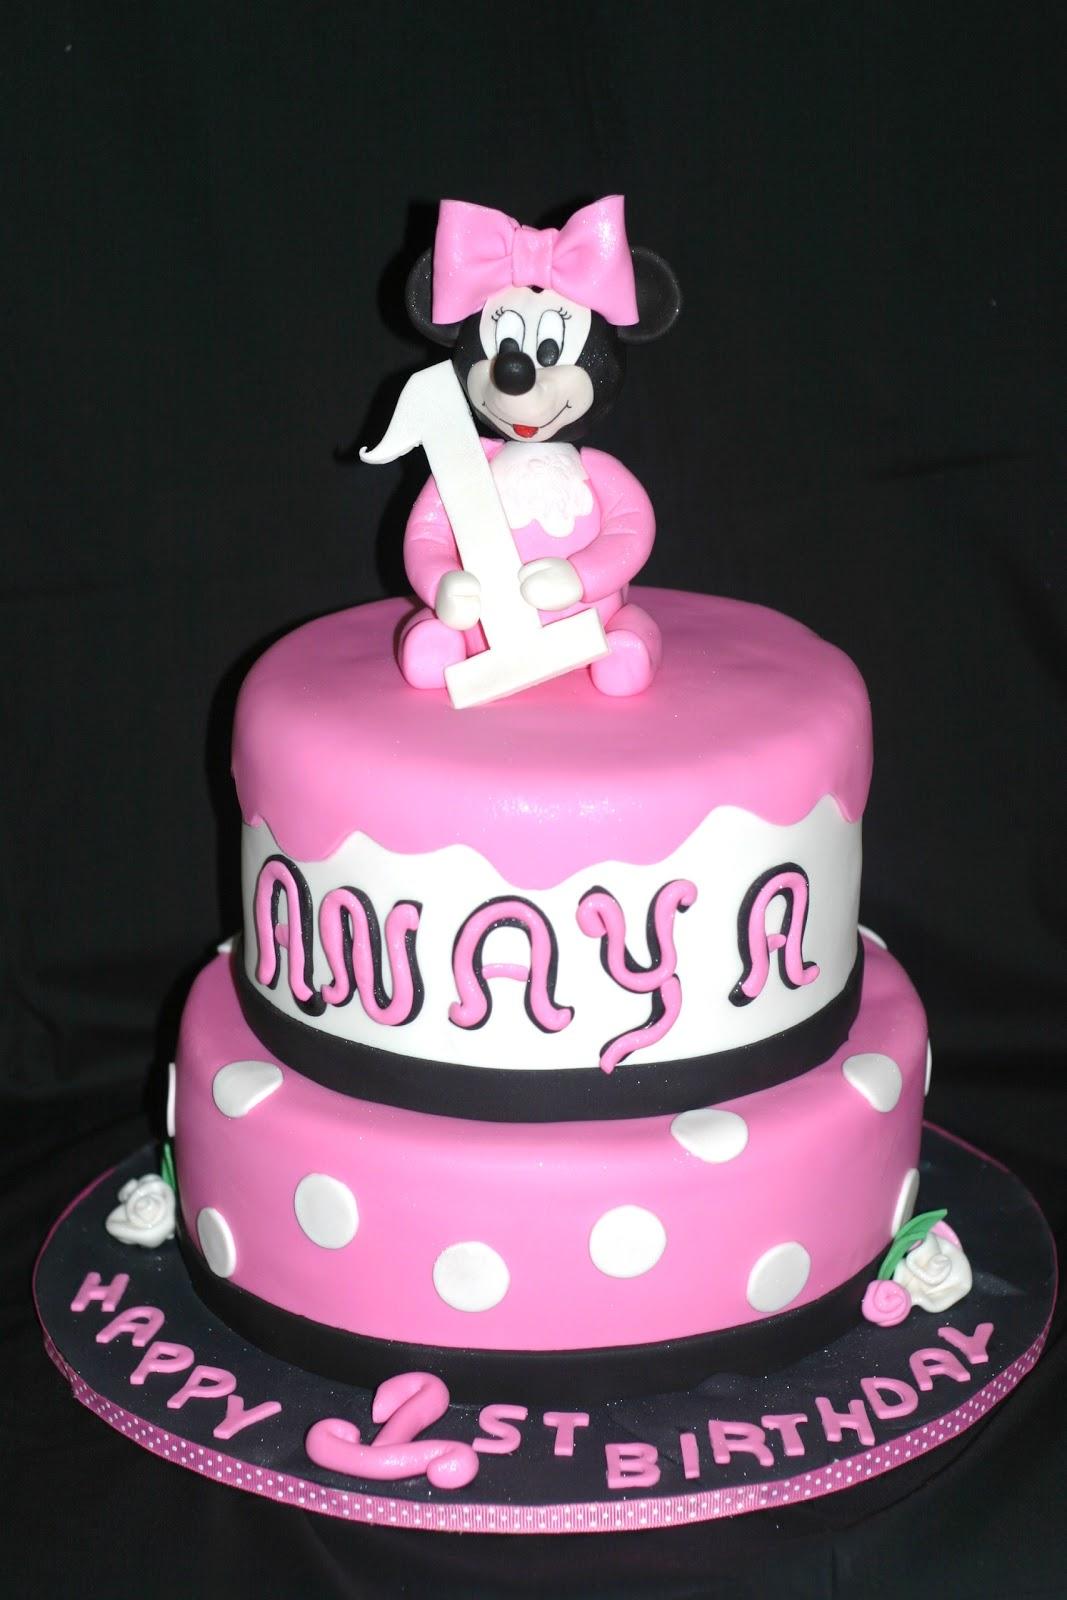 Cake Designs Minnie Mouse : Minnie Mouse Cake Design Auto Design Tech